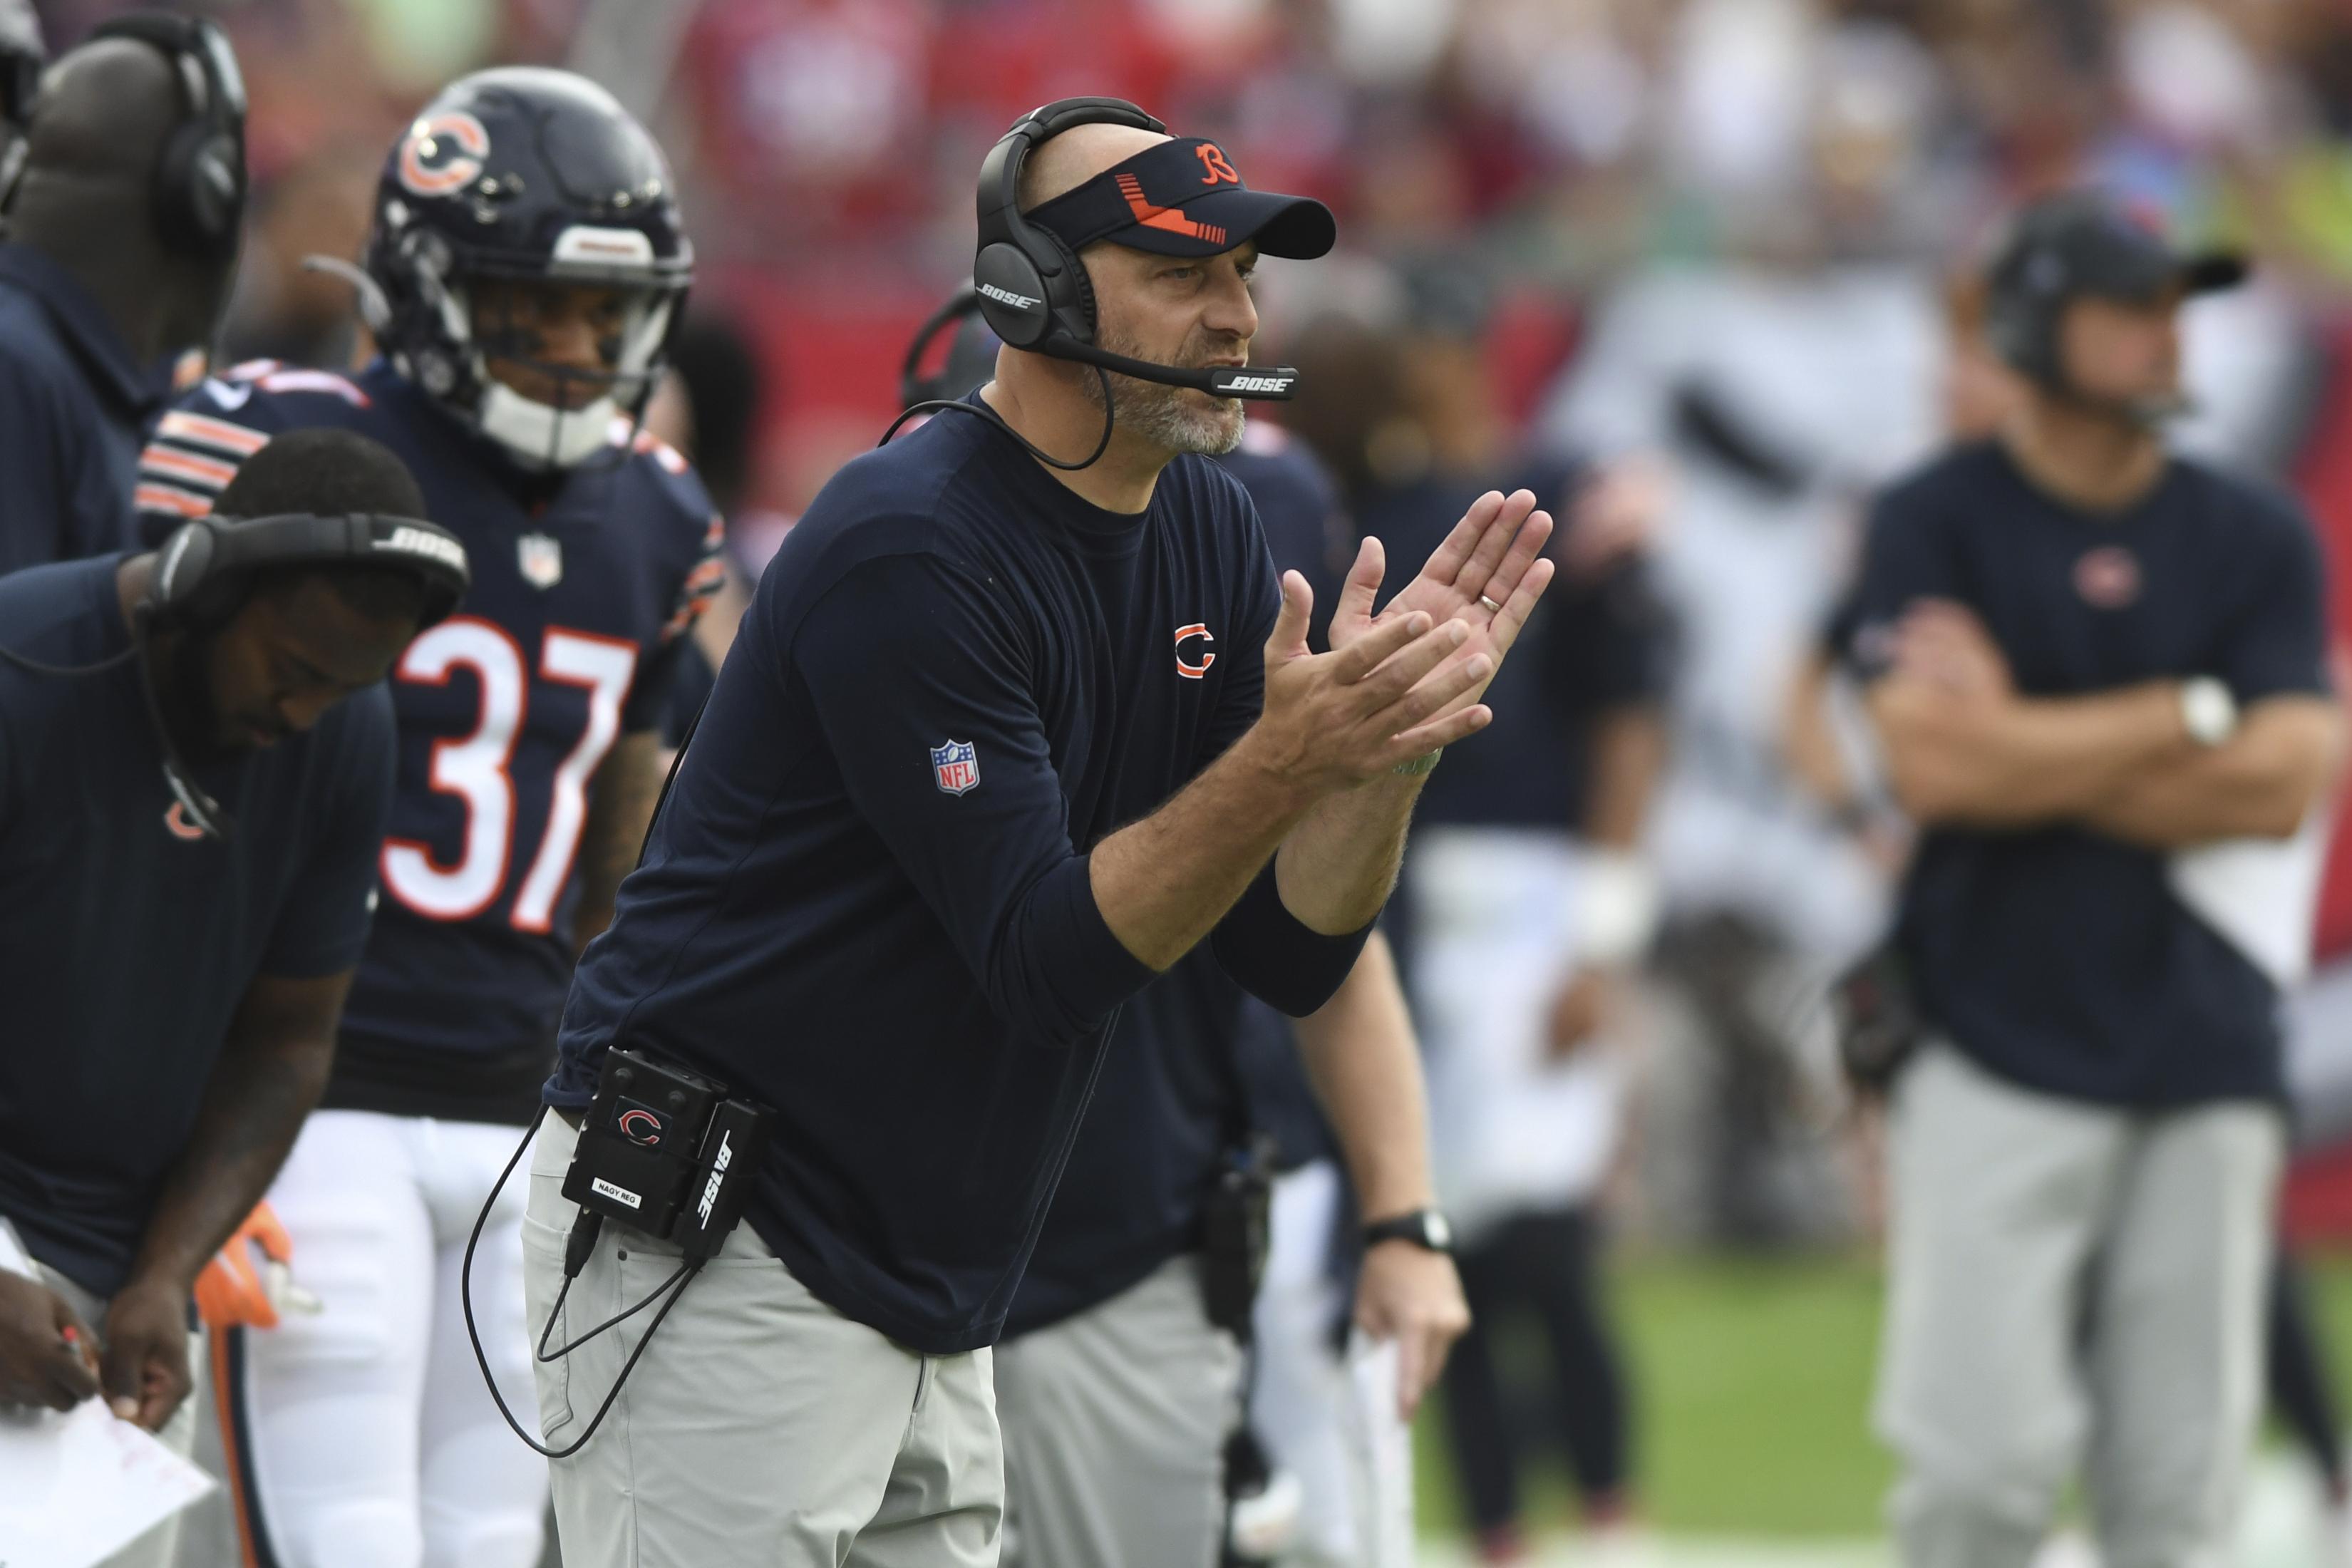 Bears coach Matt Nagy exhorts his team Sunday against the Buccaneers. The Bears lost 38-3 at Raymond James Stadium in Tampa, Fla.